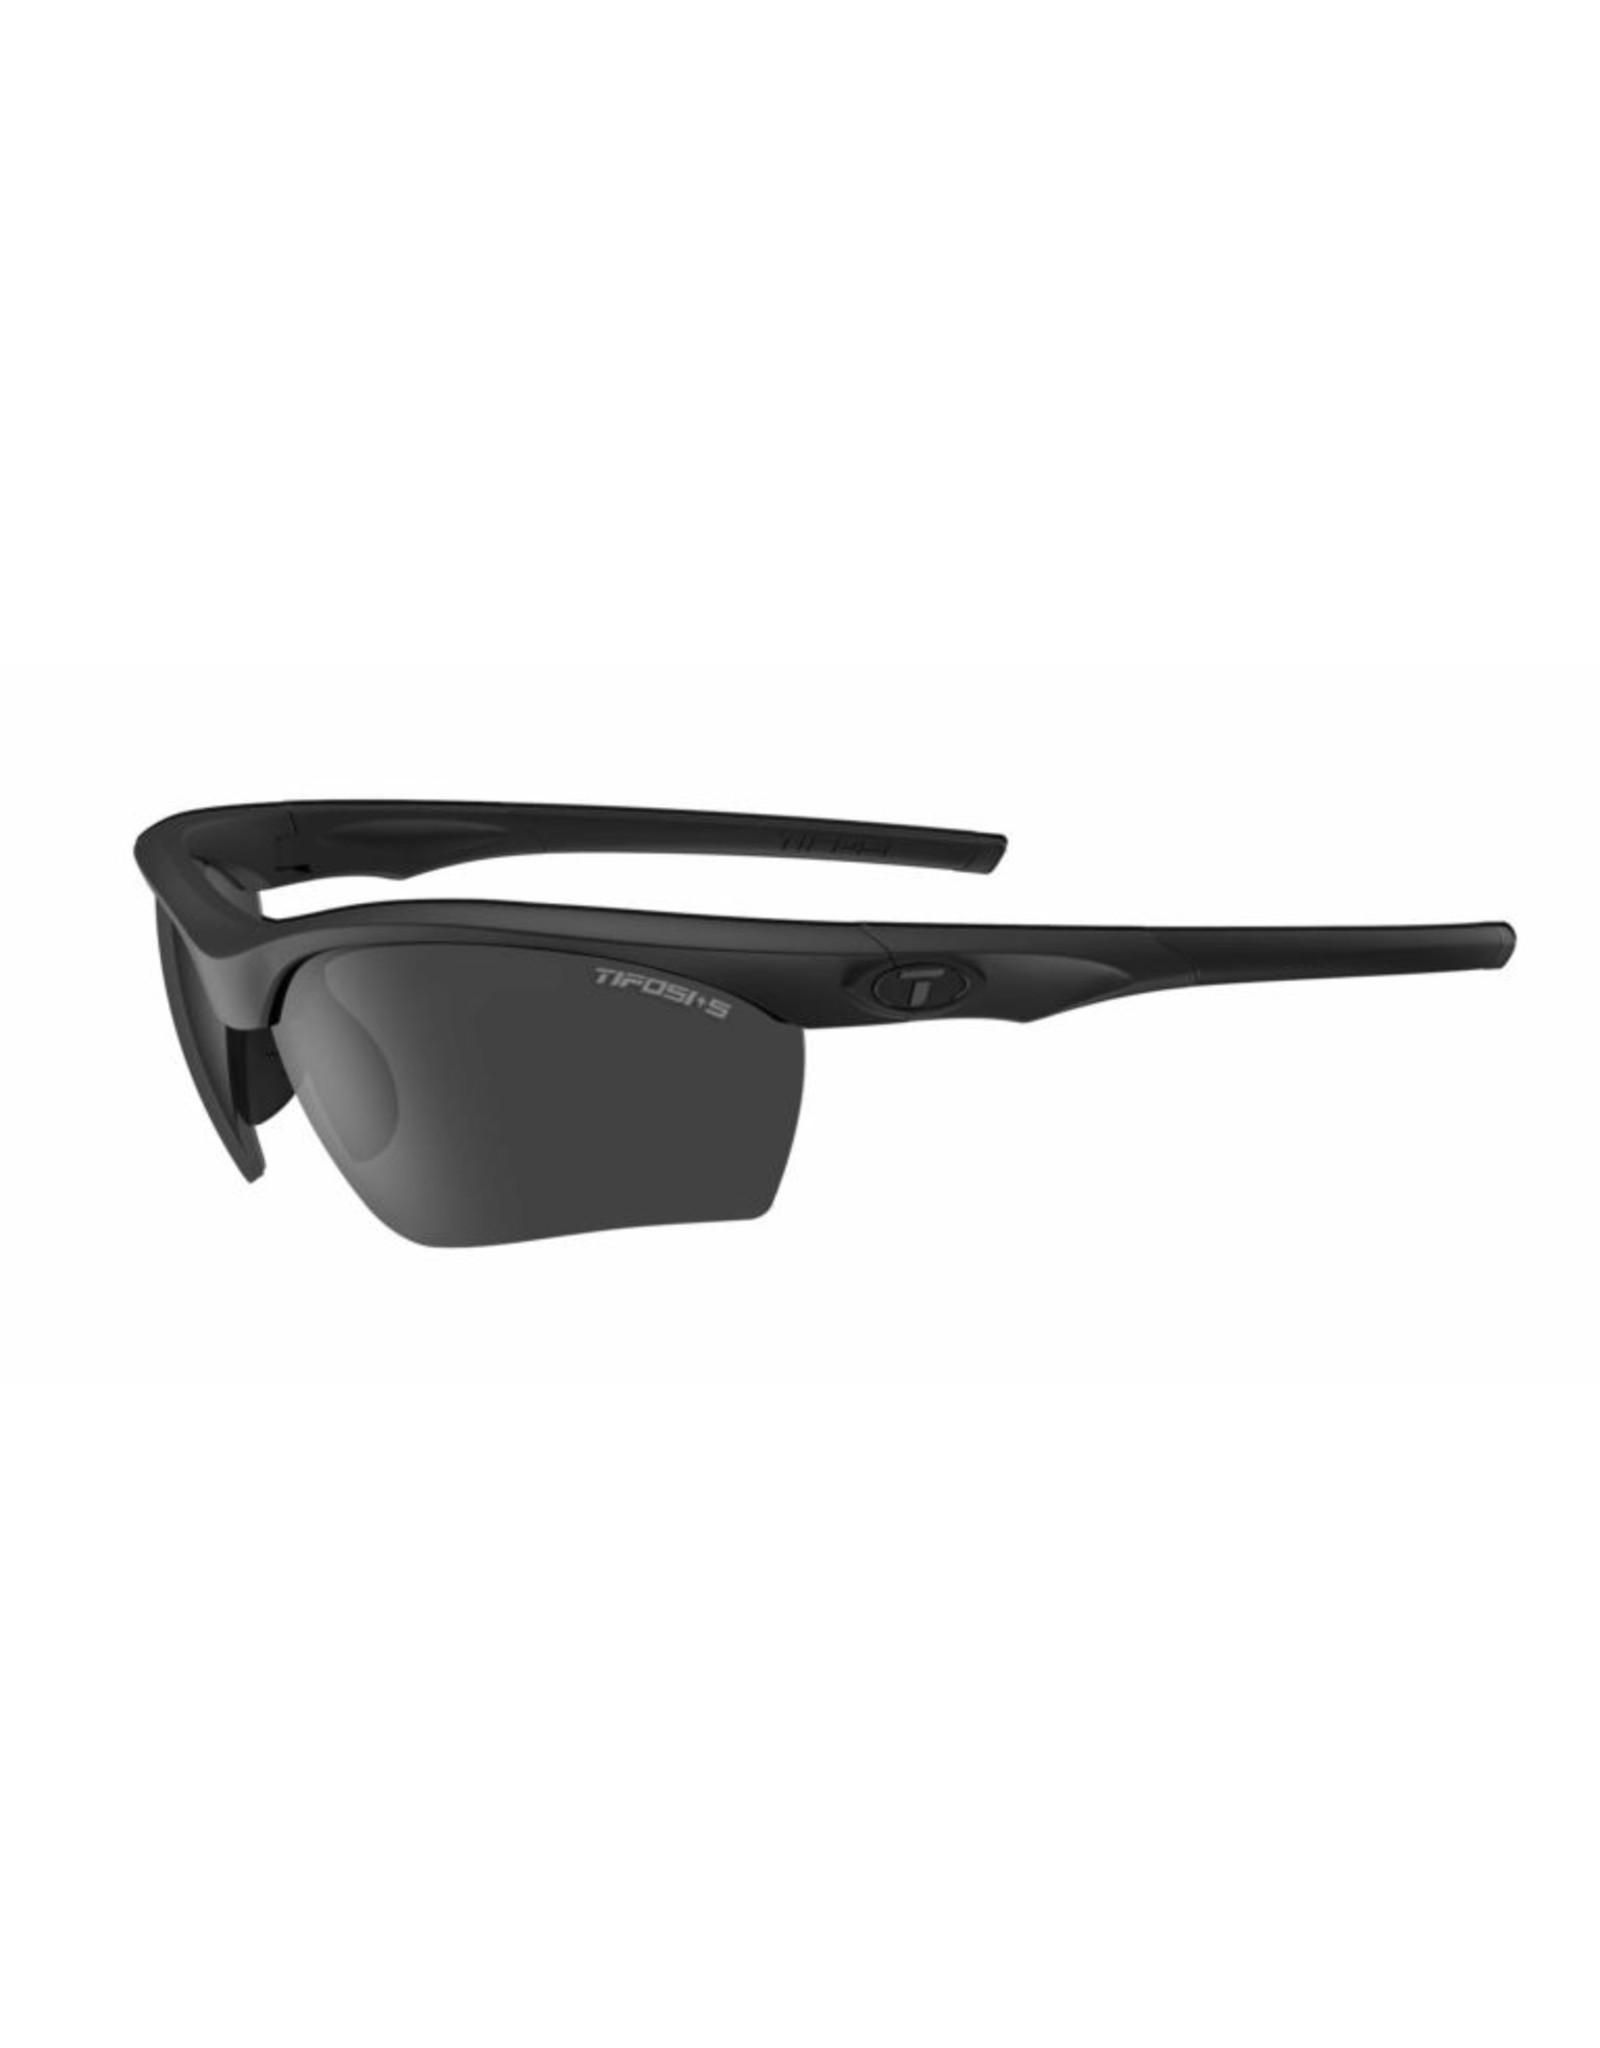 Tifosi Optics Z87.1 Vero, Matte Black Pol. Tactical Safety Sunglasses - Smoke Polarized